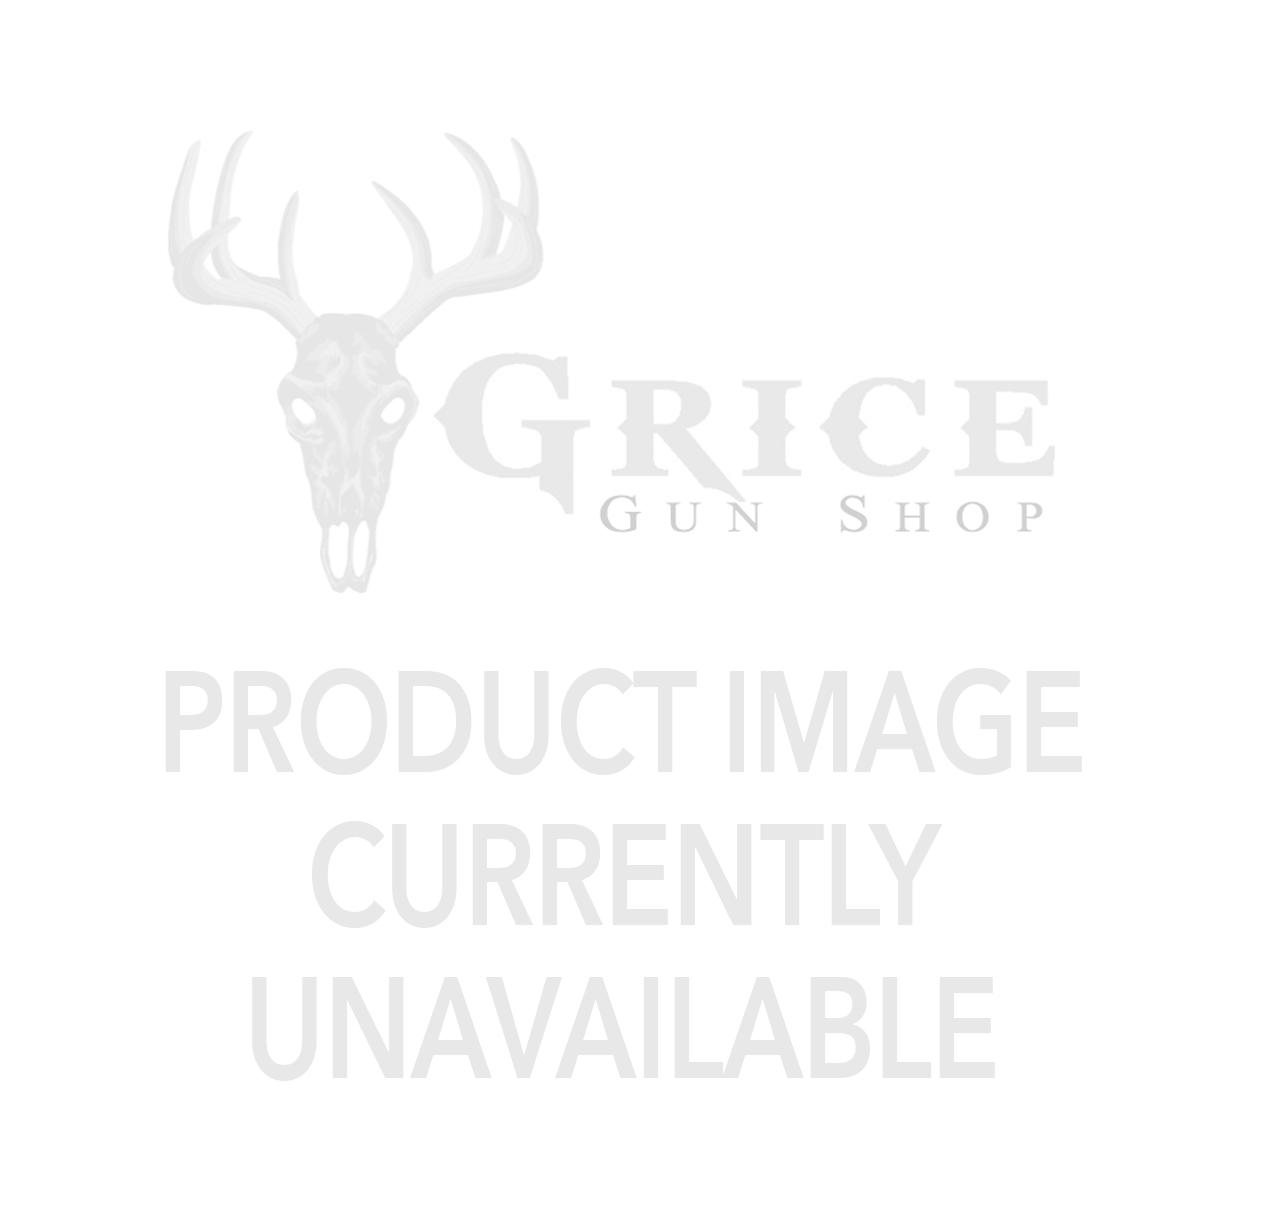 Butler Creek - Alaskan Magnum Sling (Mossy Oak Break-Up Camouflage)